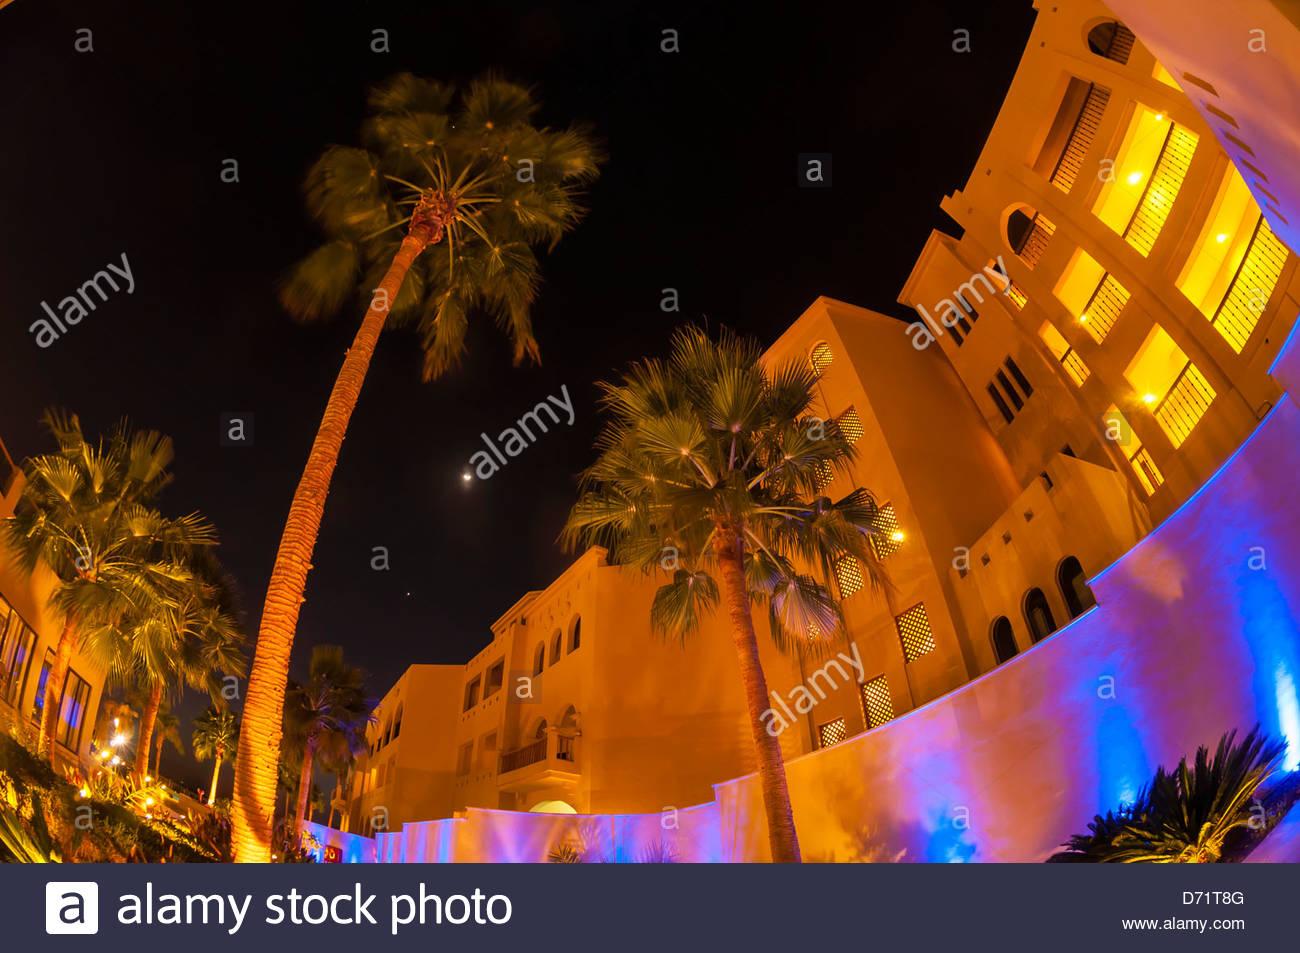 Radisson Blu Tala Bay Resort on the Gulf of Aqaba, Red Sea, near Aqaba, Jordan. - Stock Image